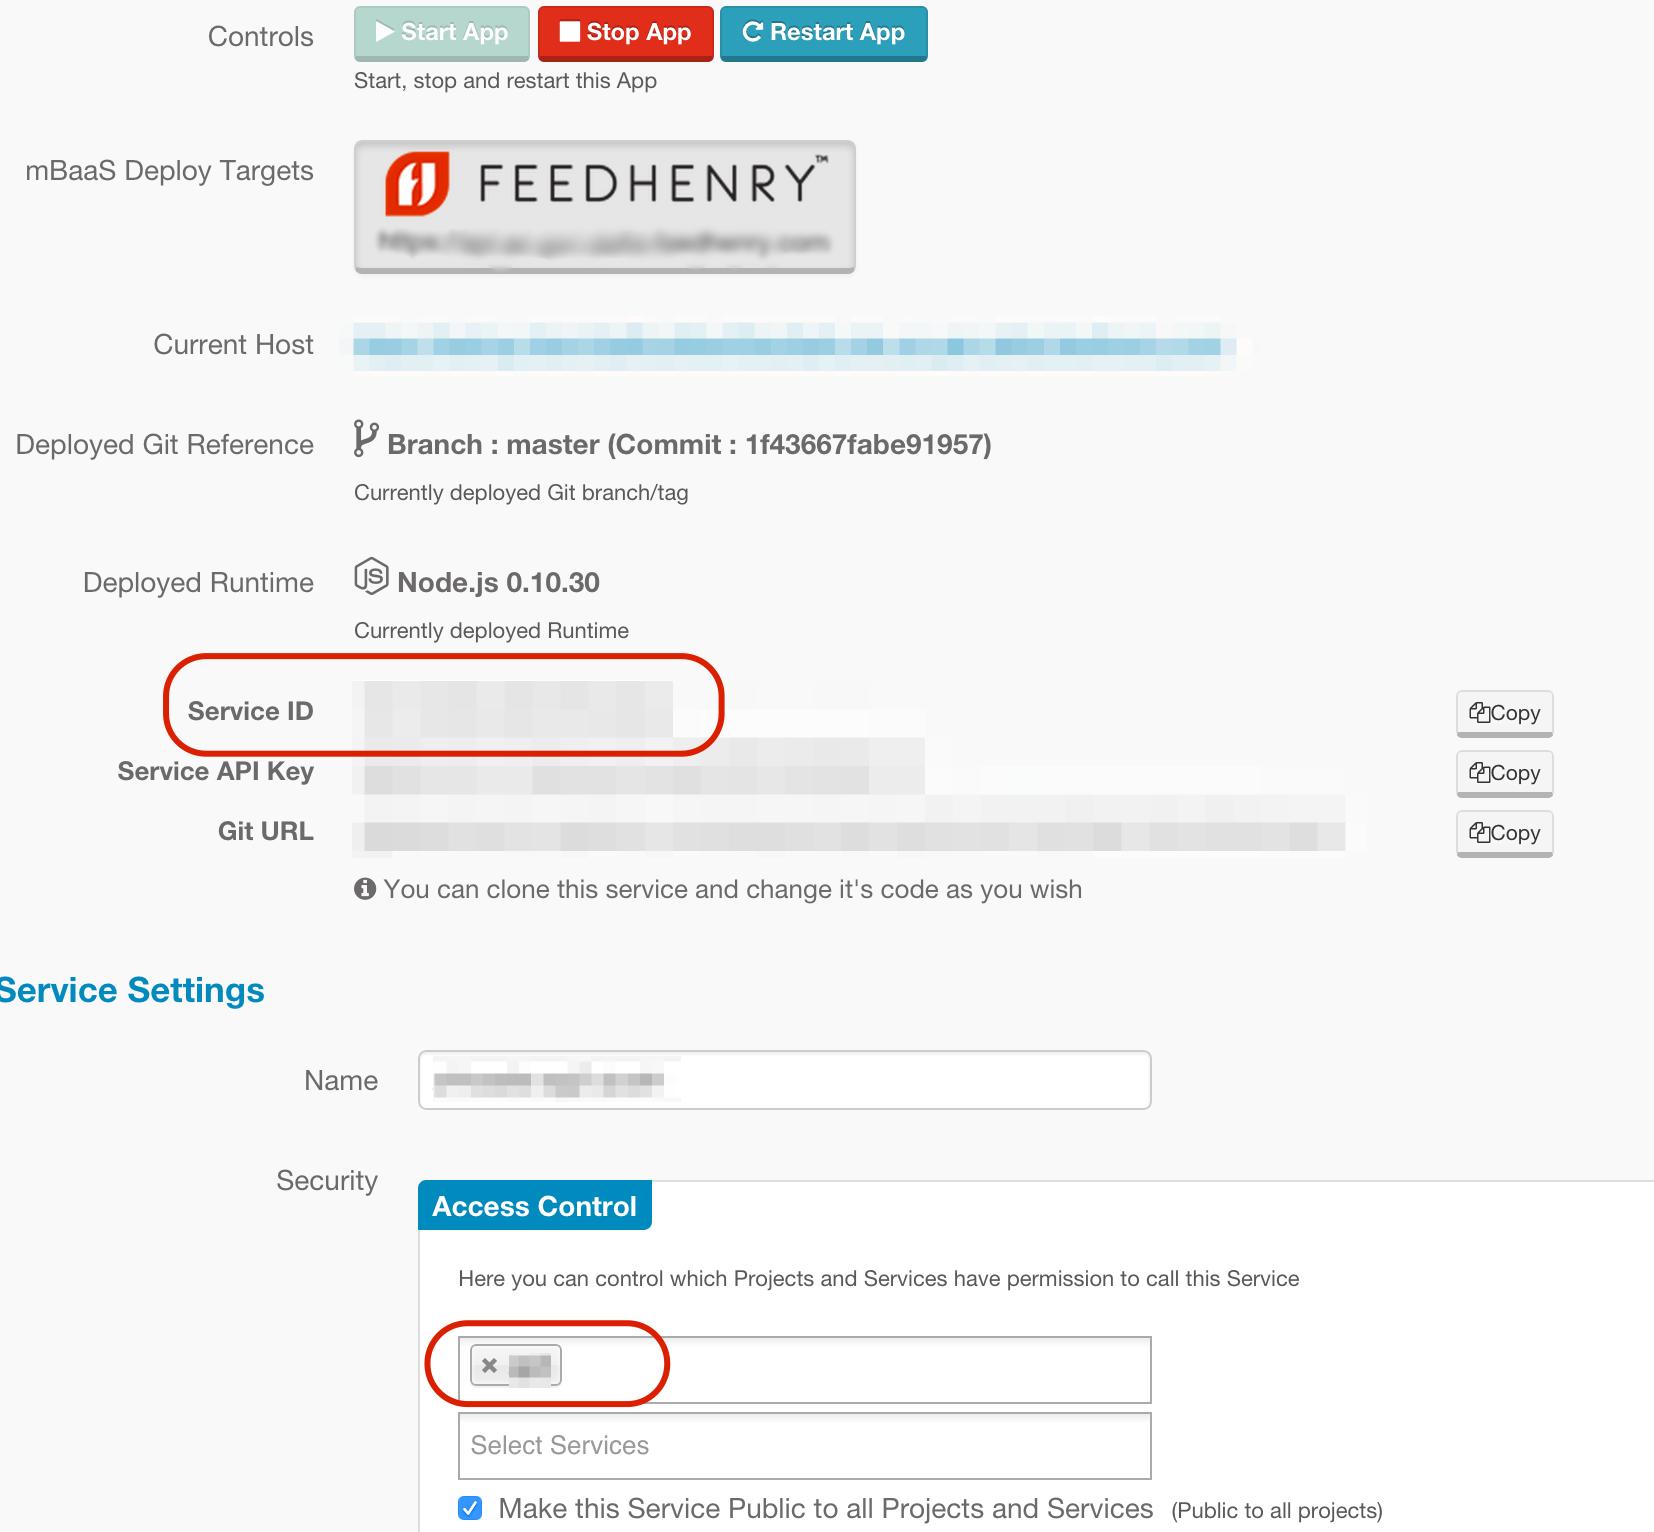 Service Connector Details